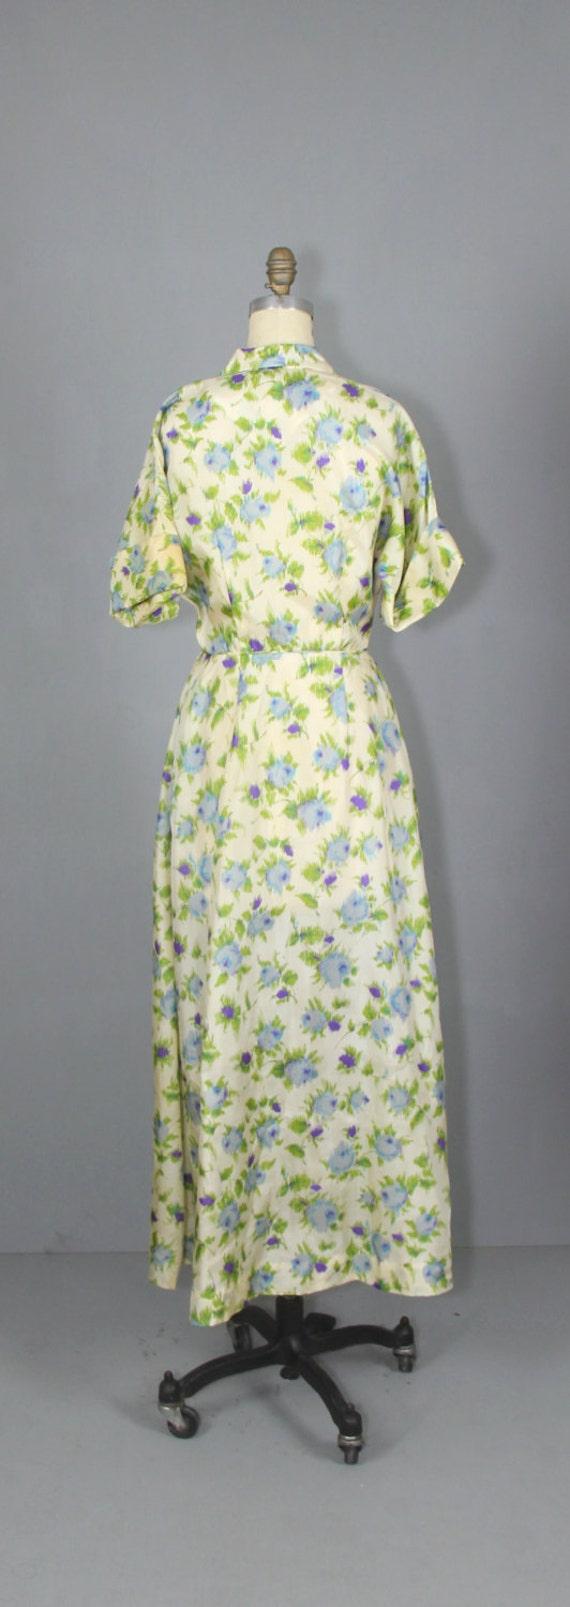 1940s robe / silk robe / dressing gown / SUGAR PL… - image 4